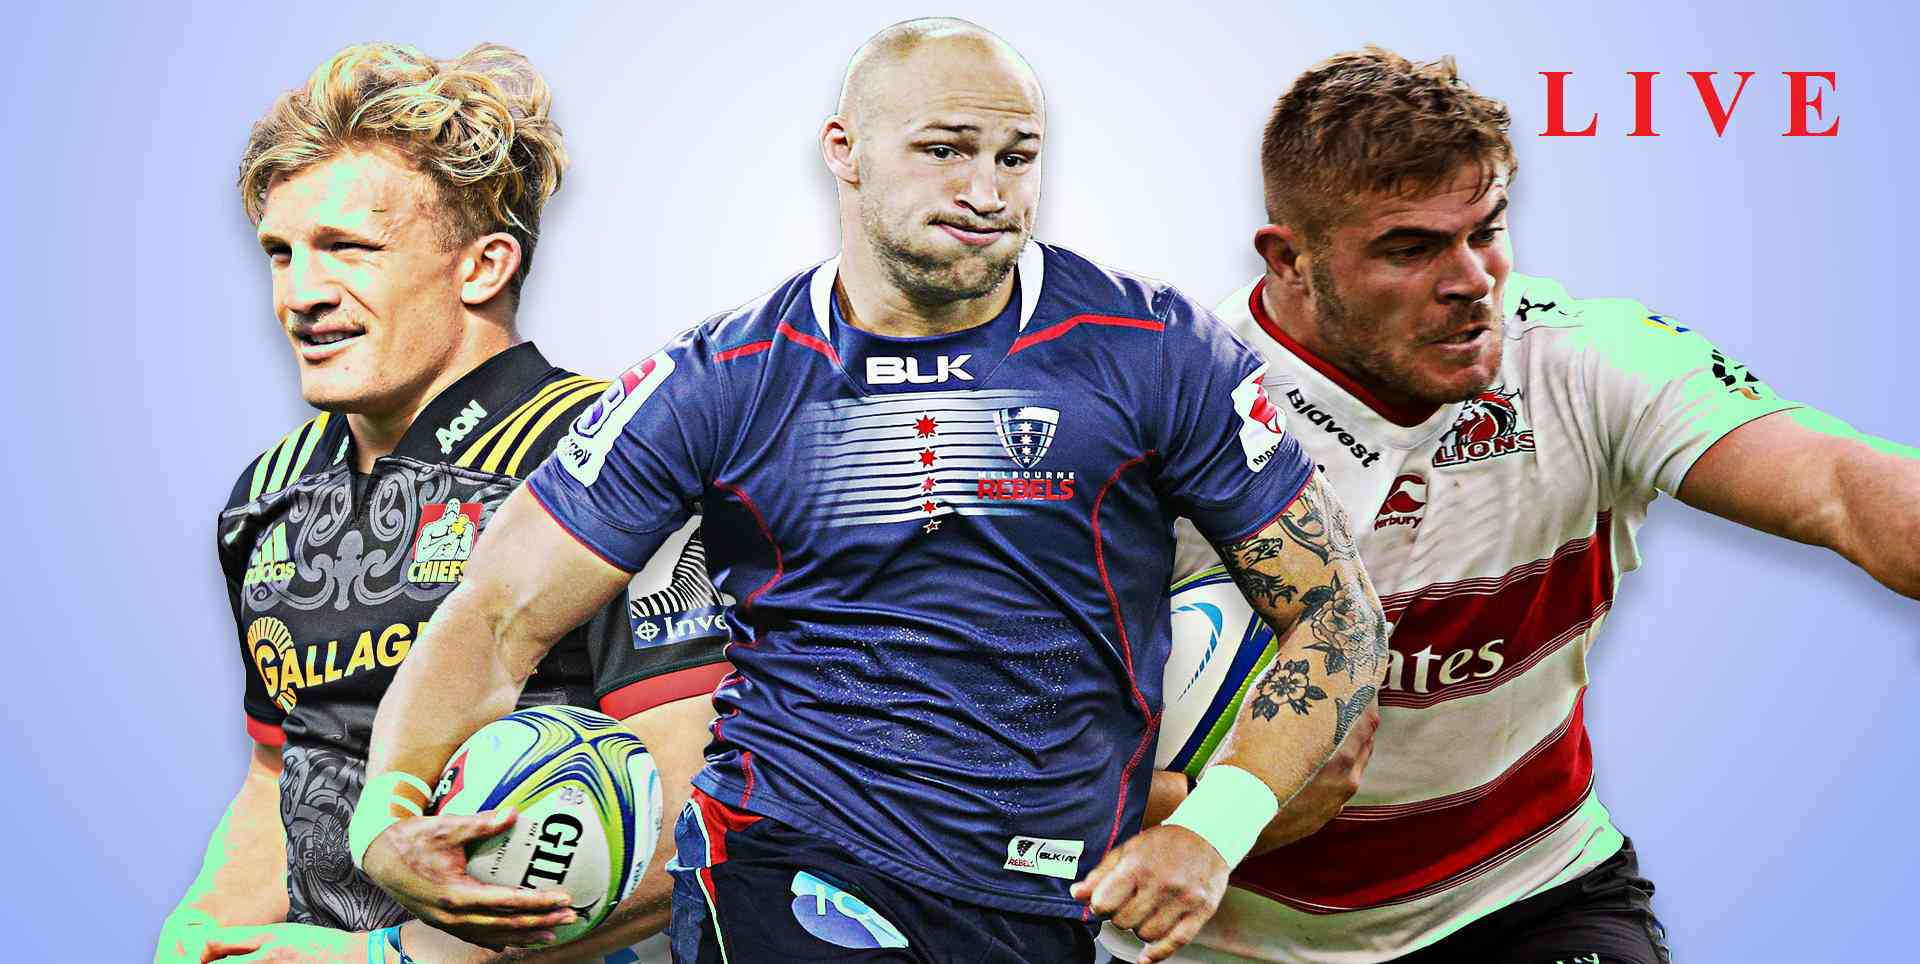 munster-vs-zebre-rugby-live-stream